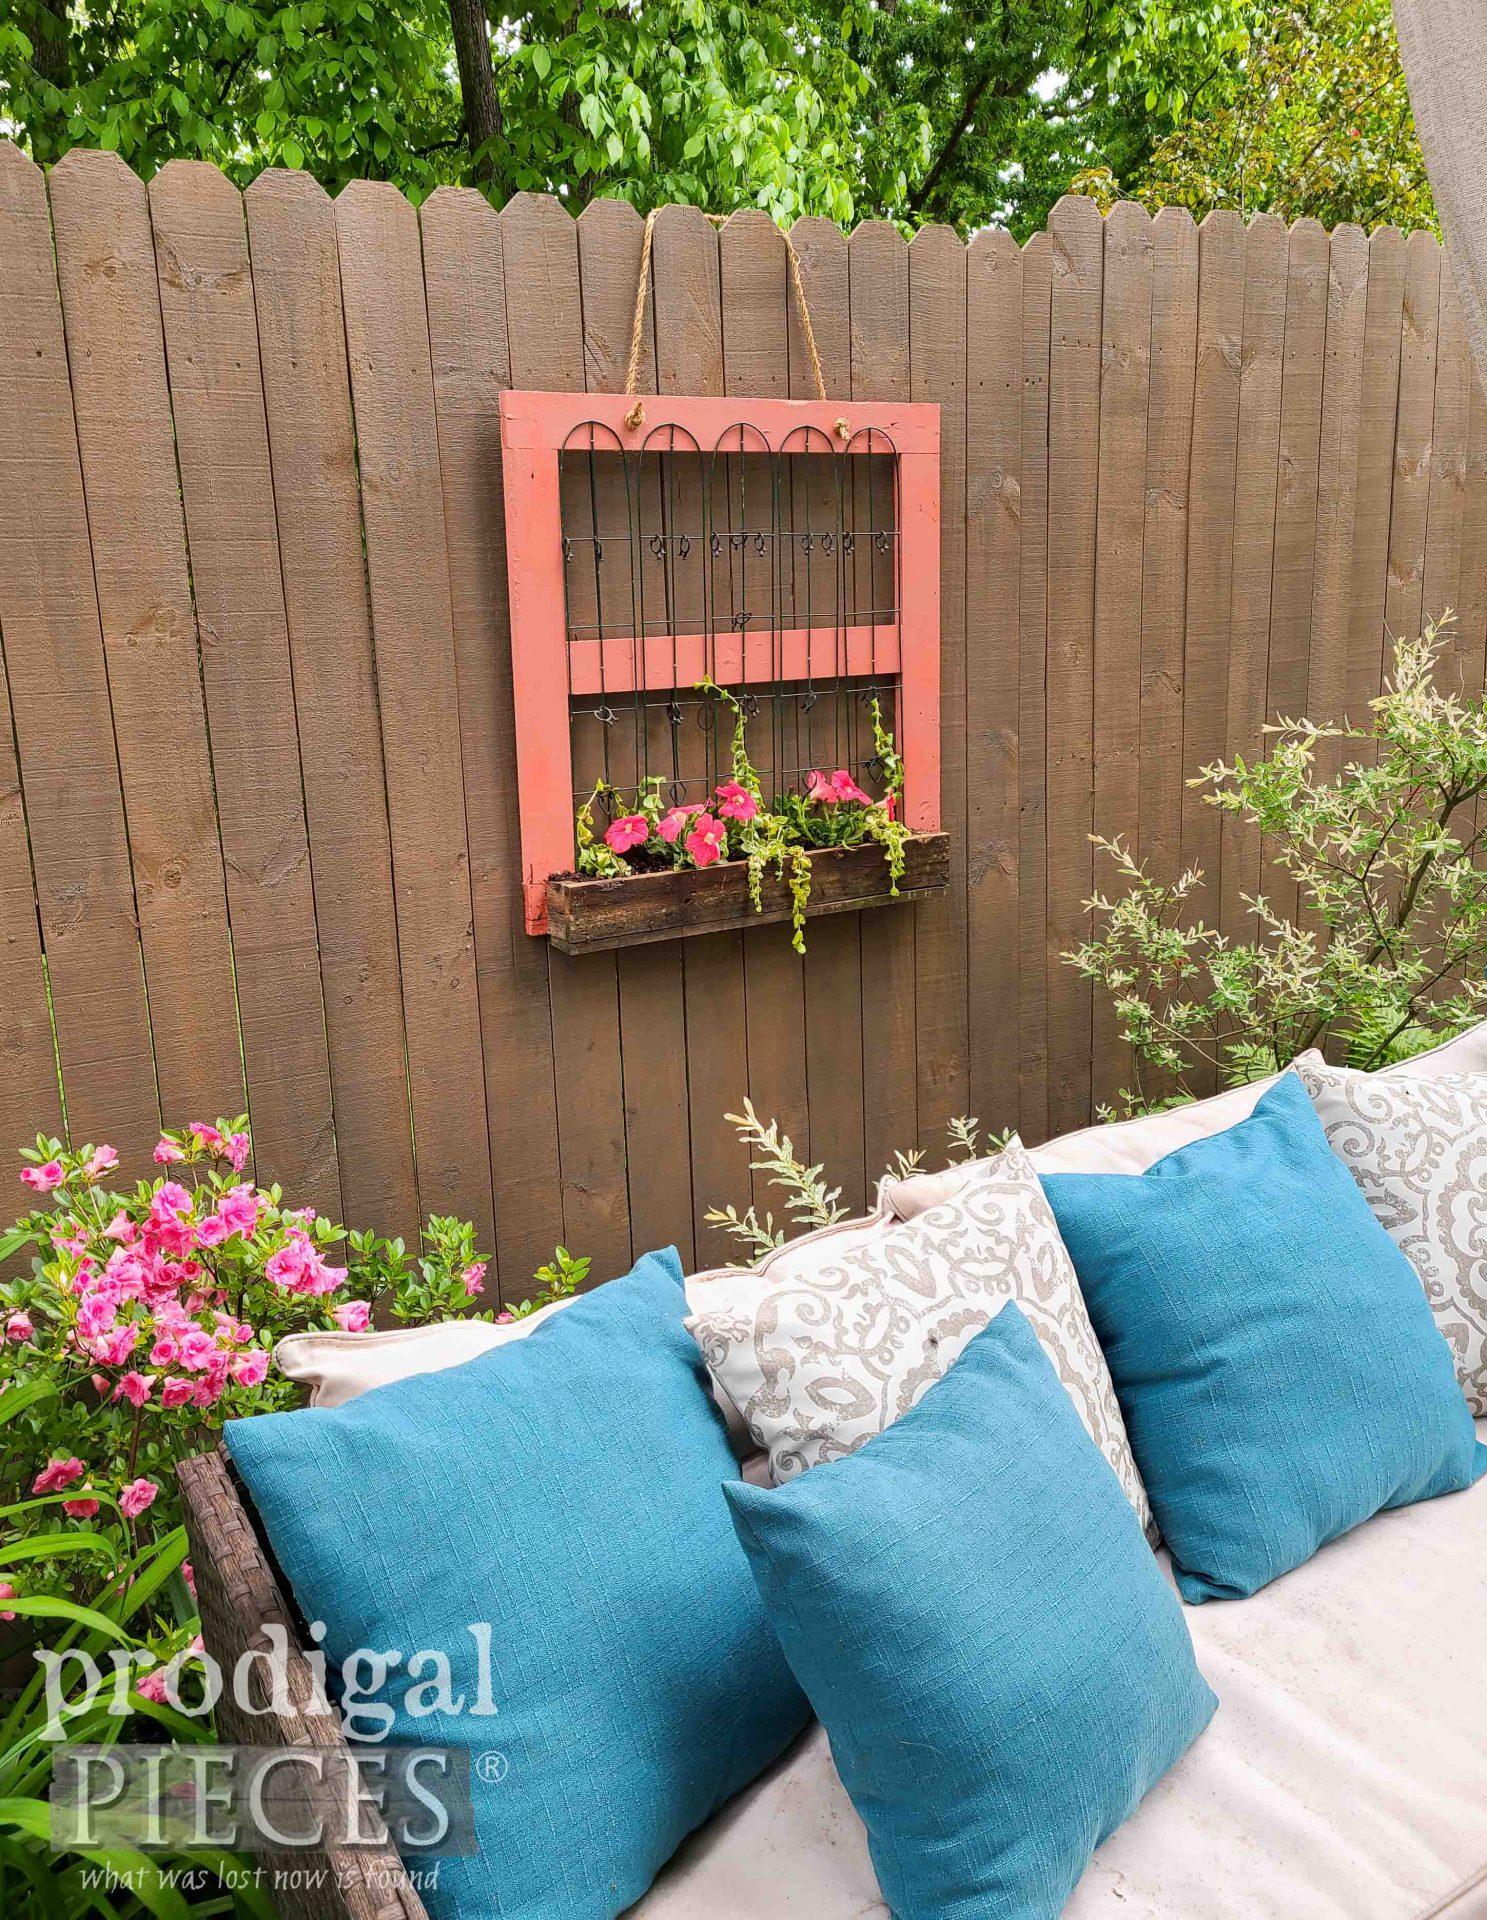 Farmhouse Style Patio Decor with Hanging Fence Planter by Prodigal Pieces | prodigalpieces.com #prodigalpieces #garden #flowers #diy #patio